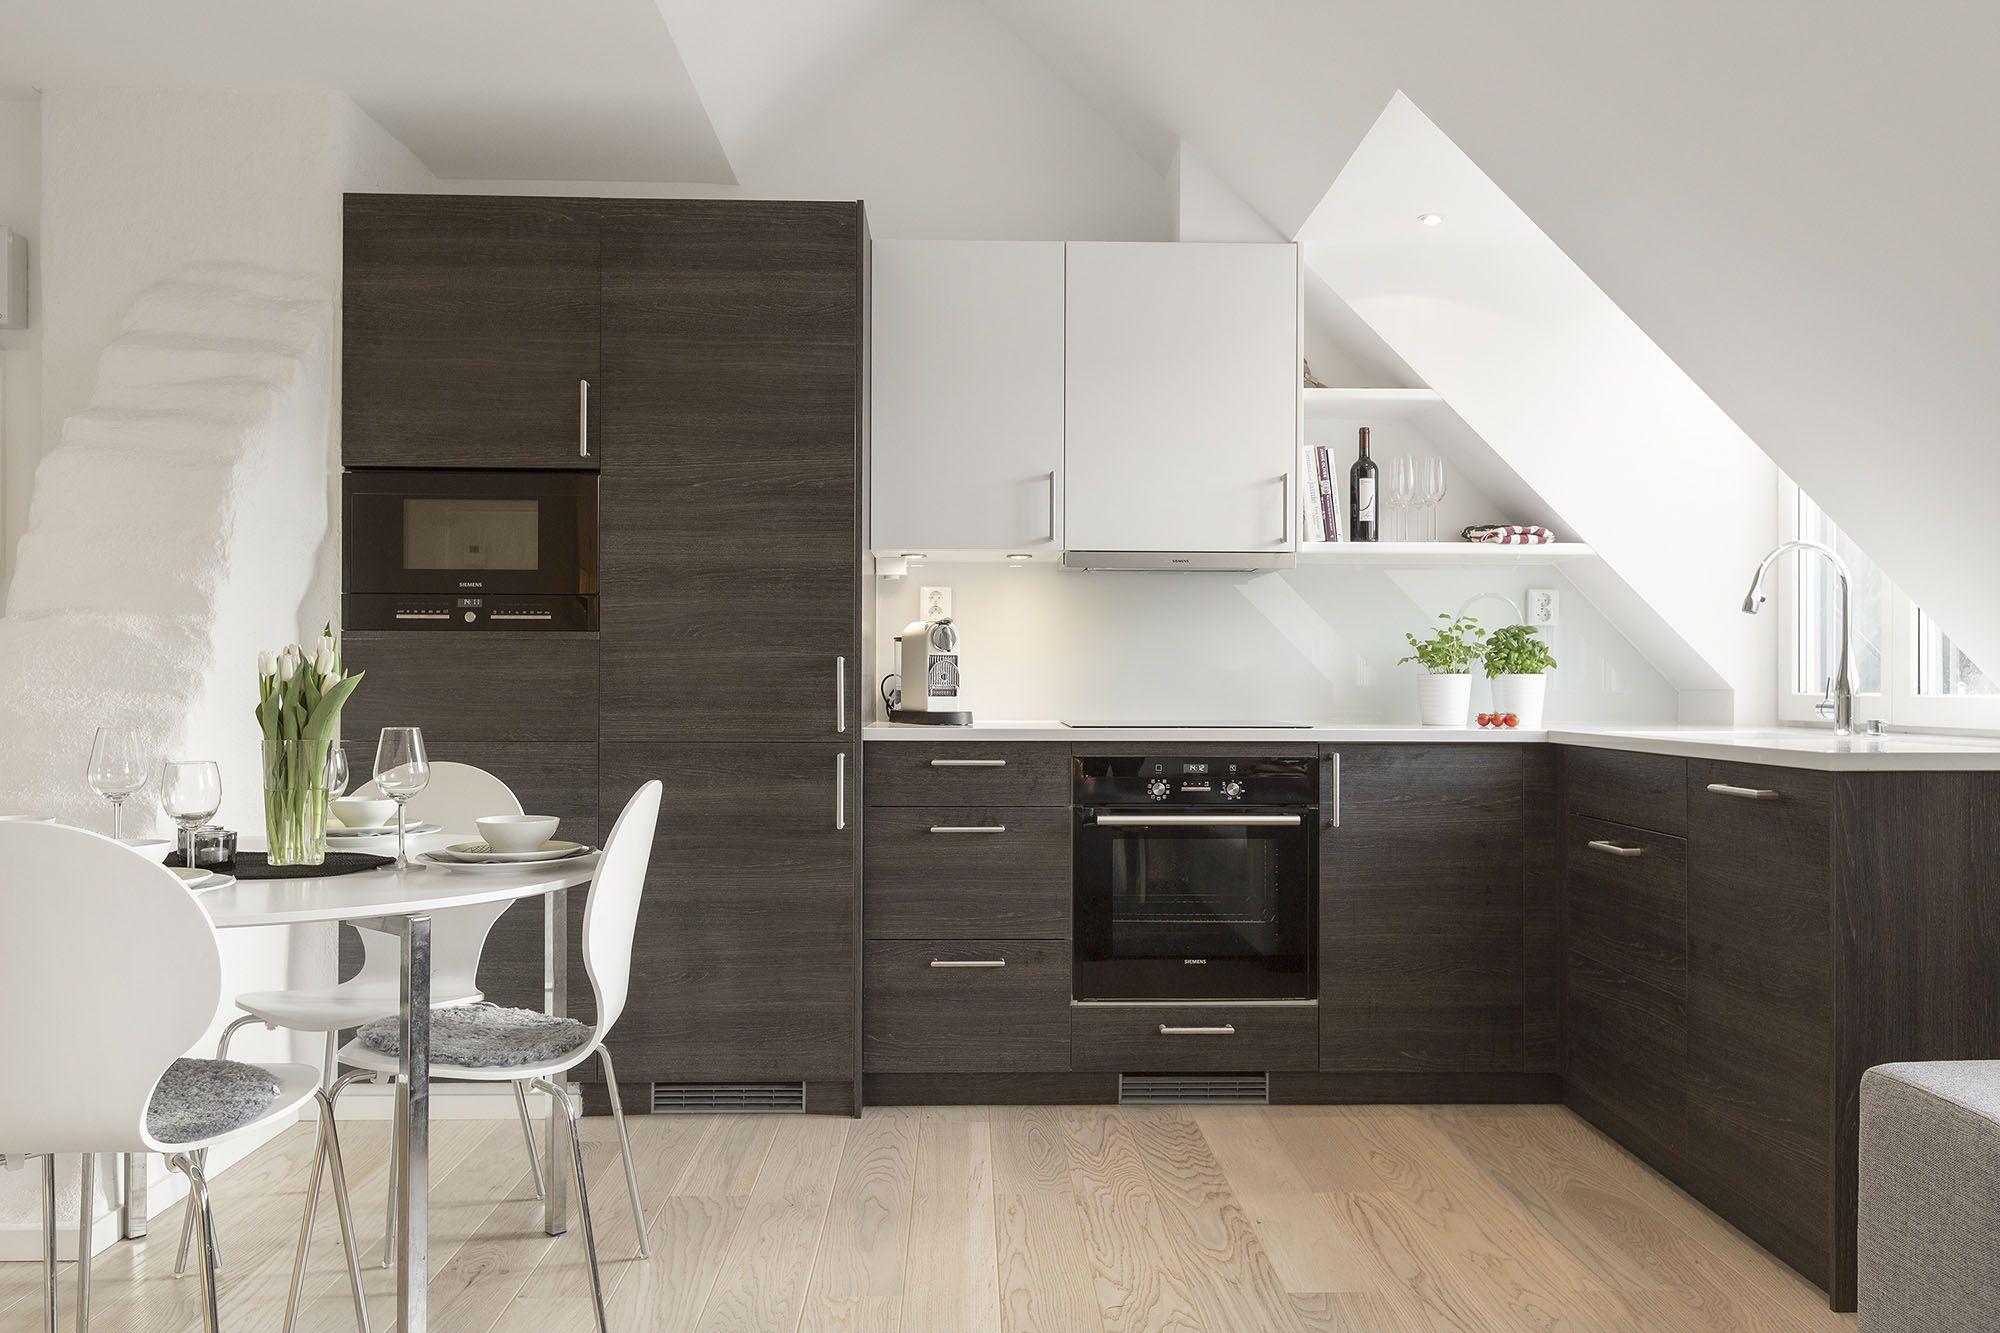 Stylish simple modern kitchen kitchen pinterest attic loft